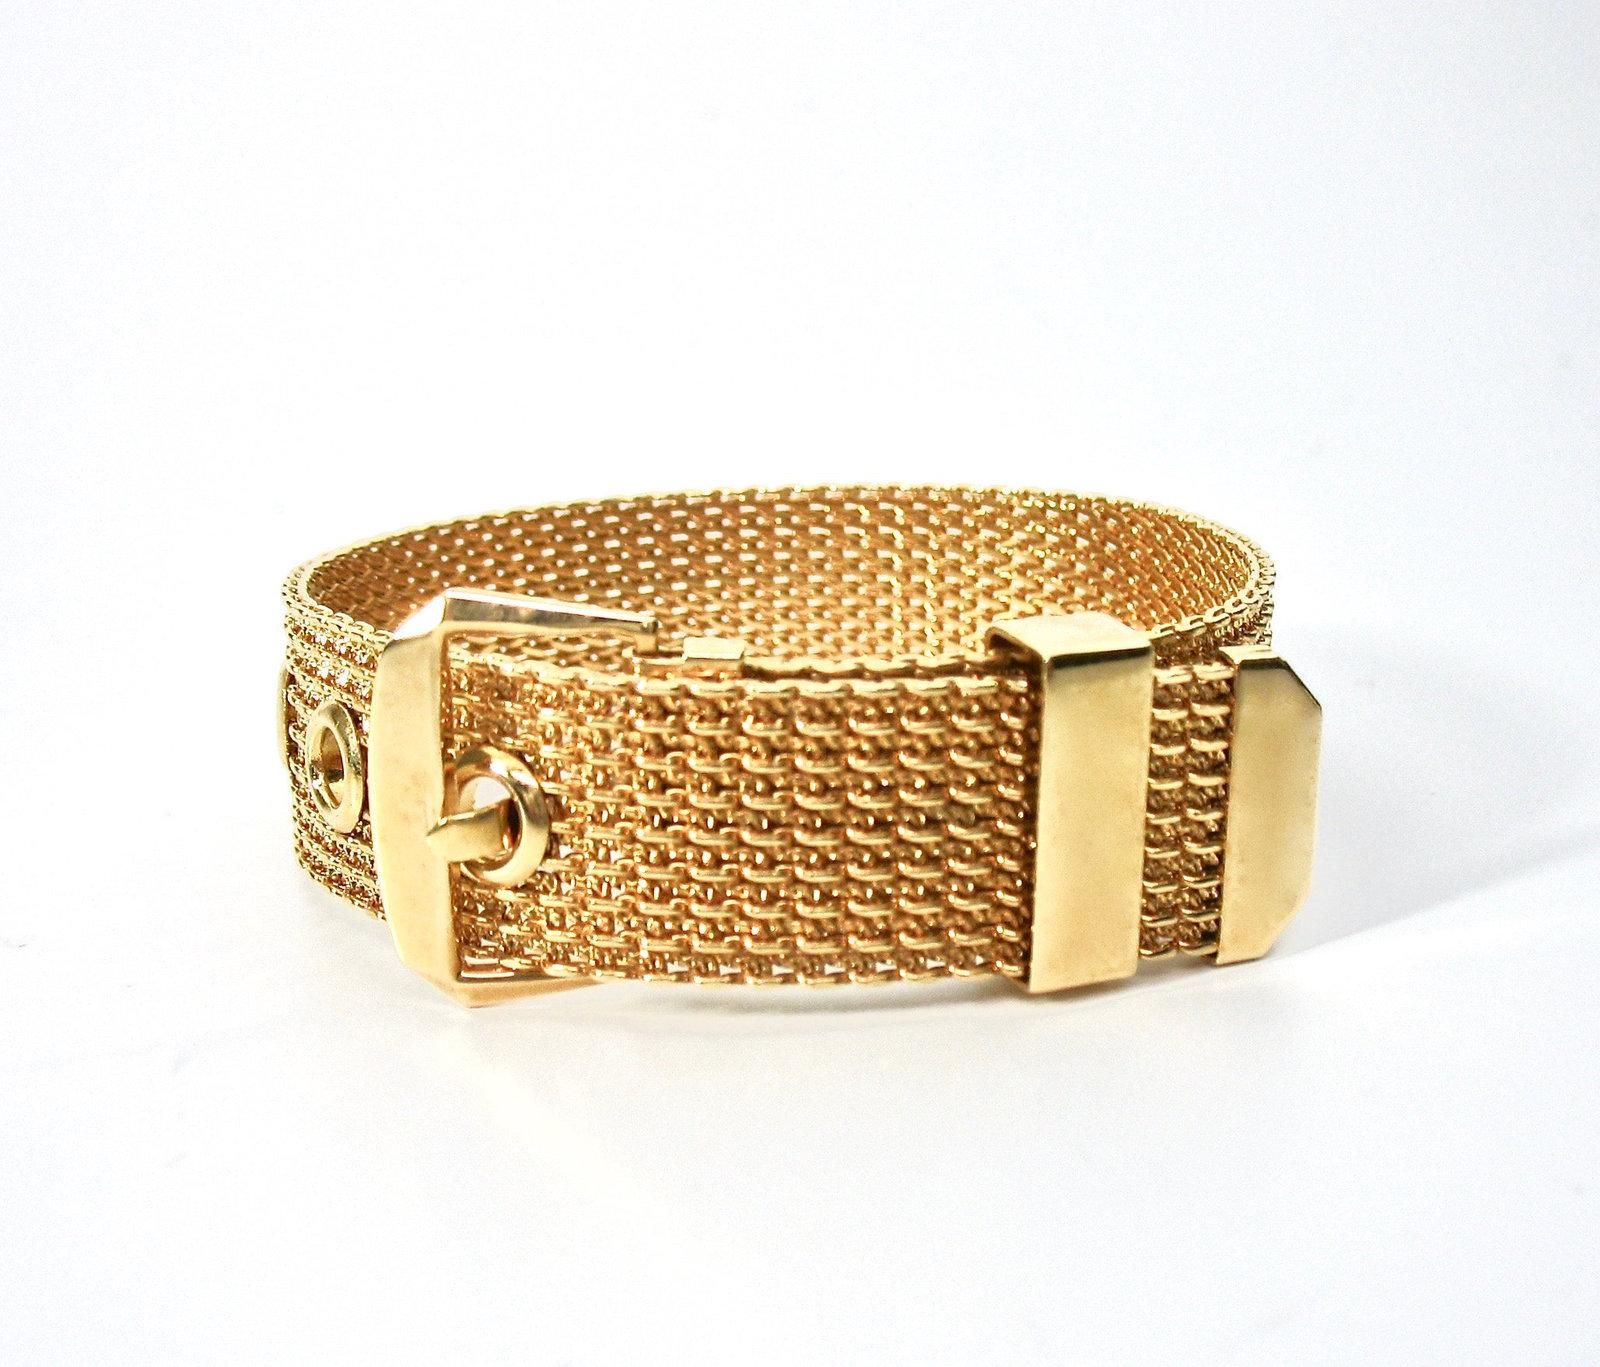 Mesh Buckle Bracelet, Gold Tone, Avon, 1970's, Adjustable, Signed Collectible, D